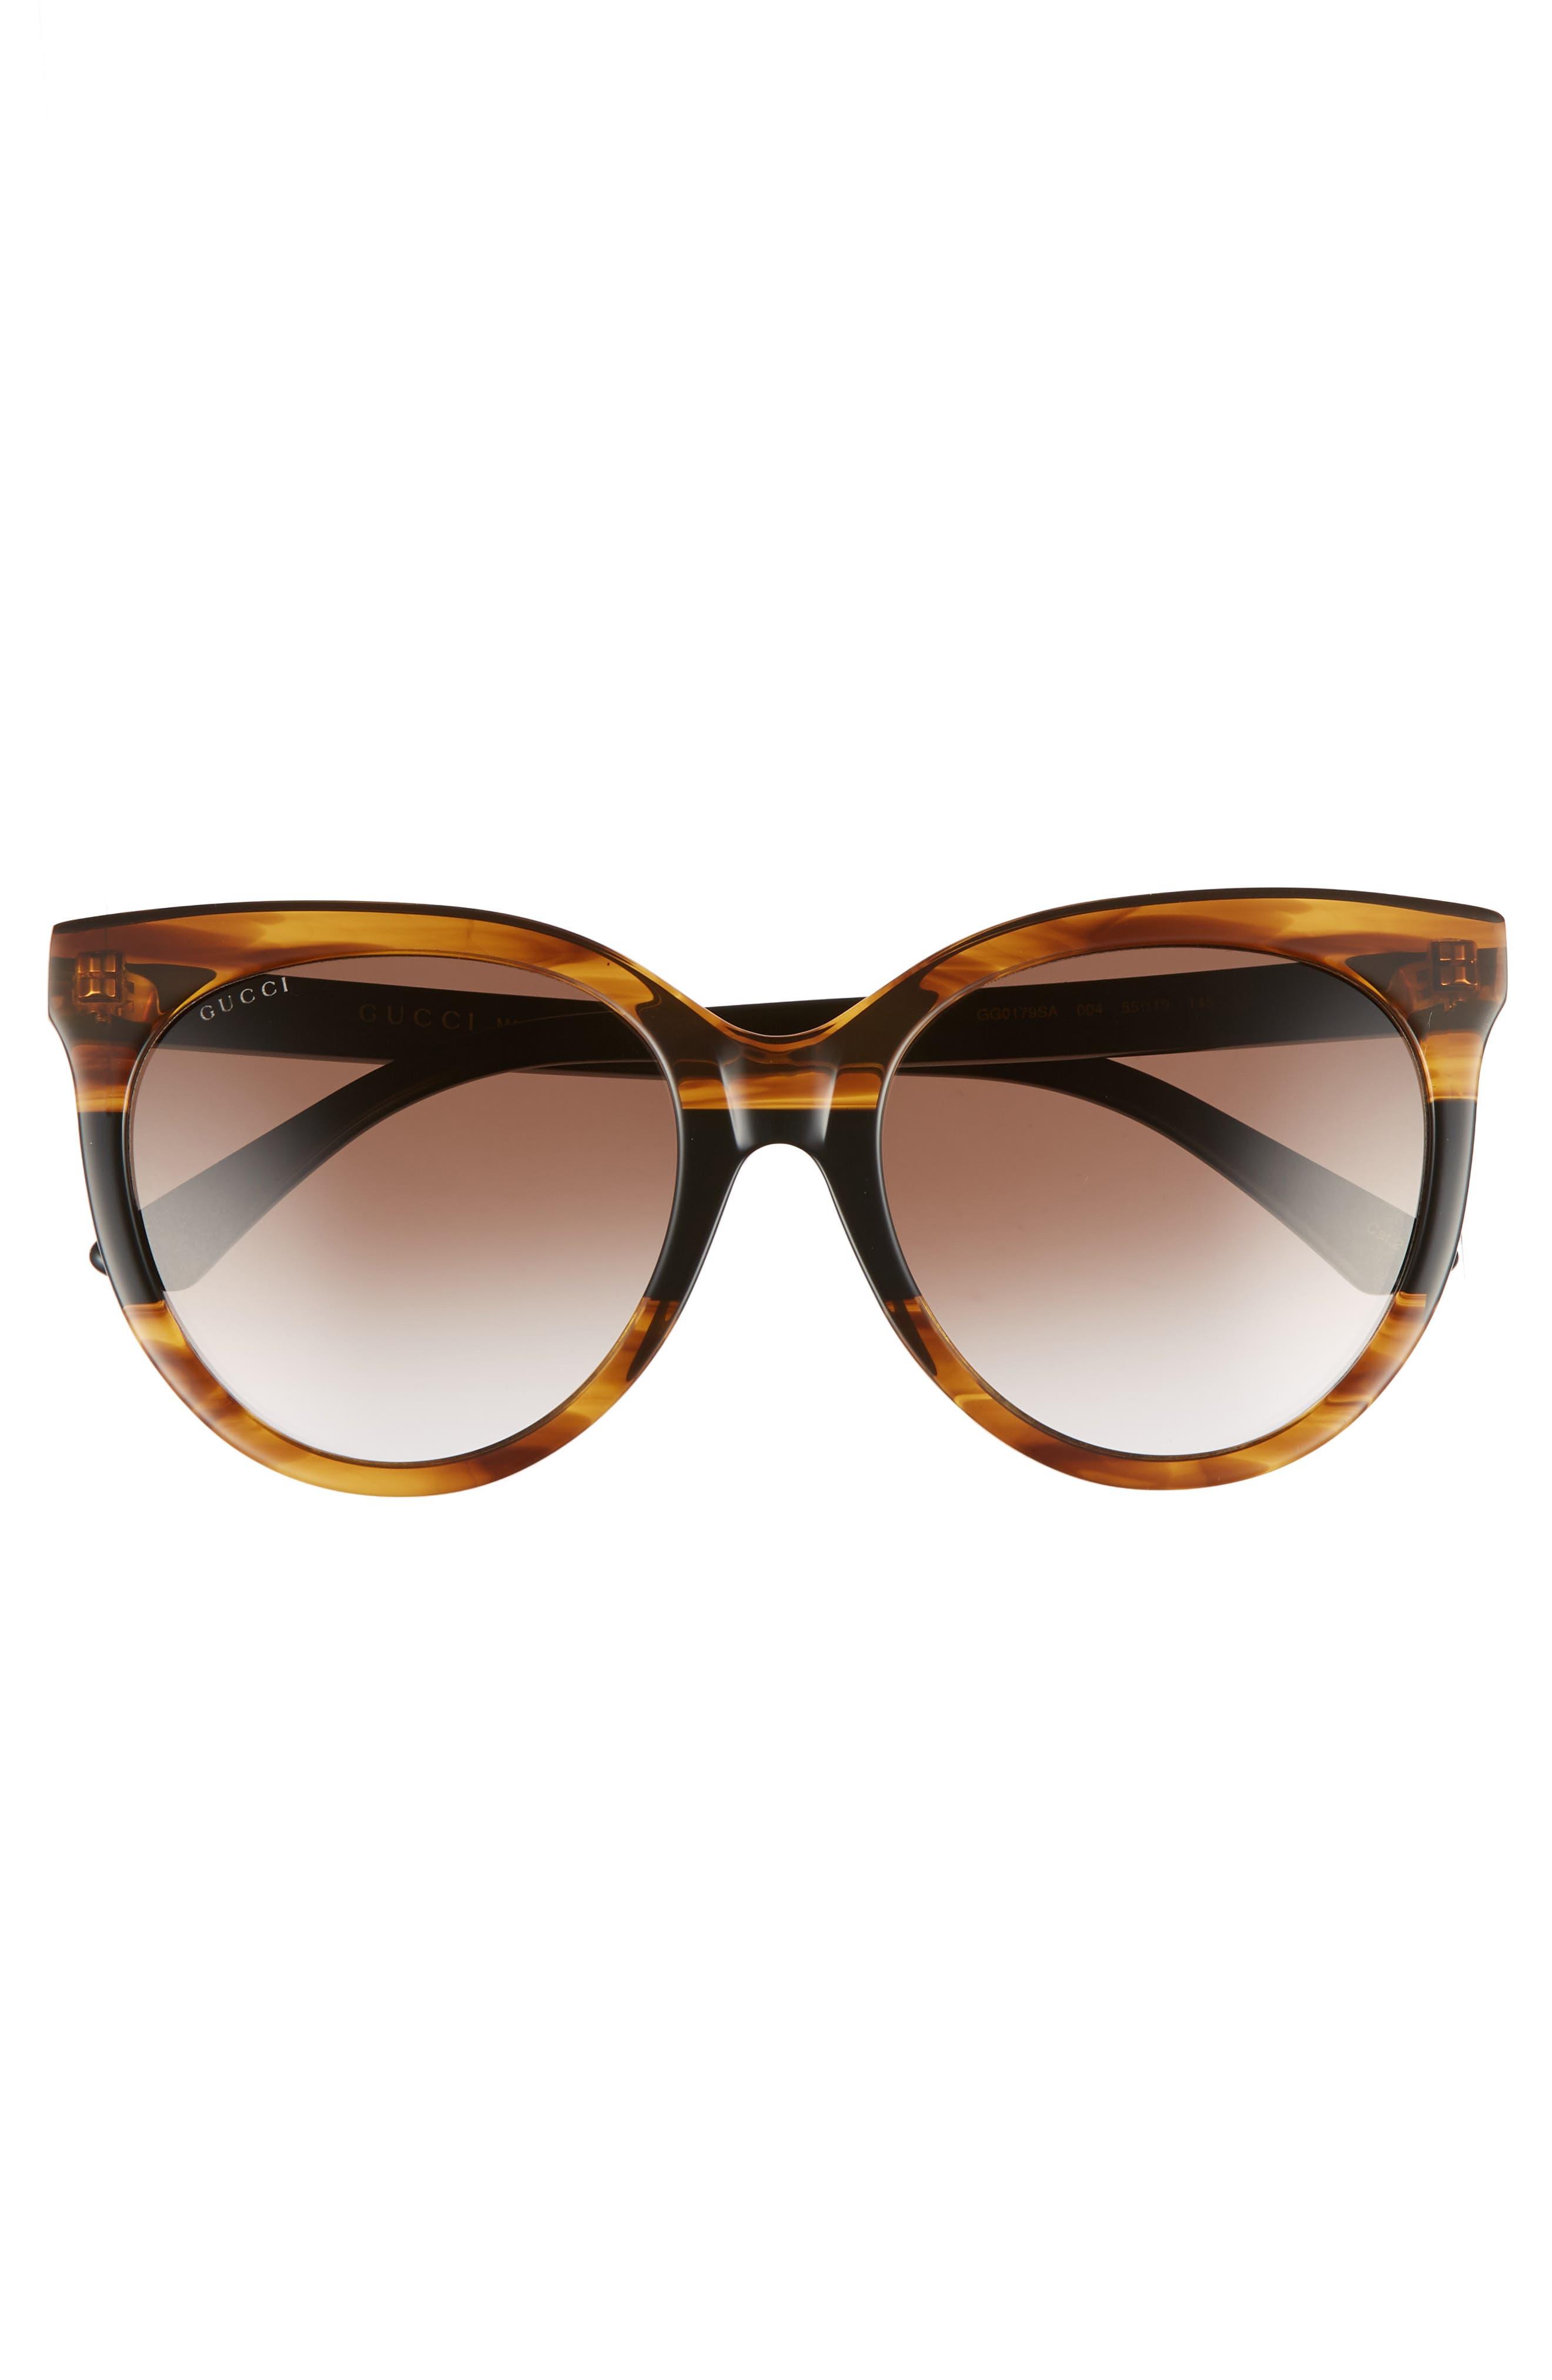 GUCCI,                             55mm Round Sunglasses,                             Alternate thumbnail 3, color,                             213